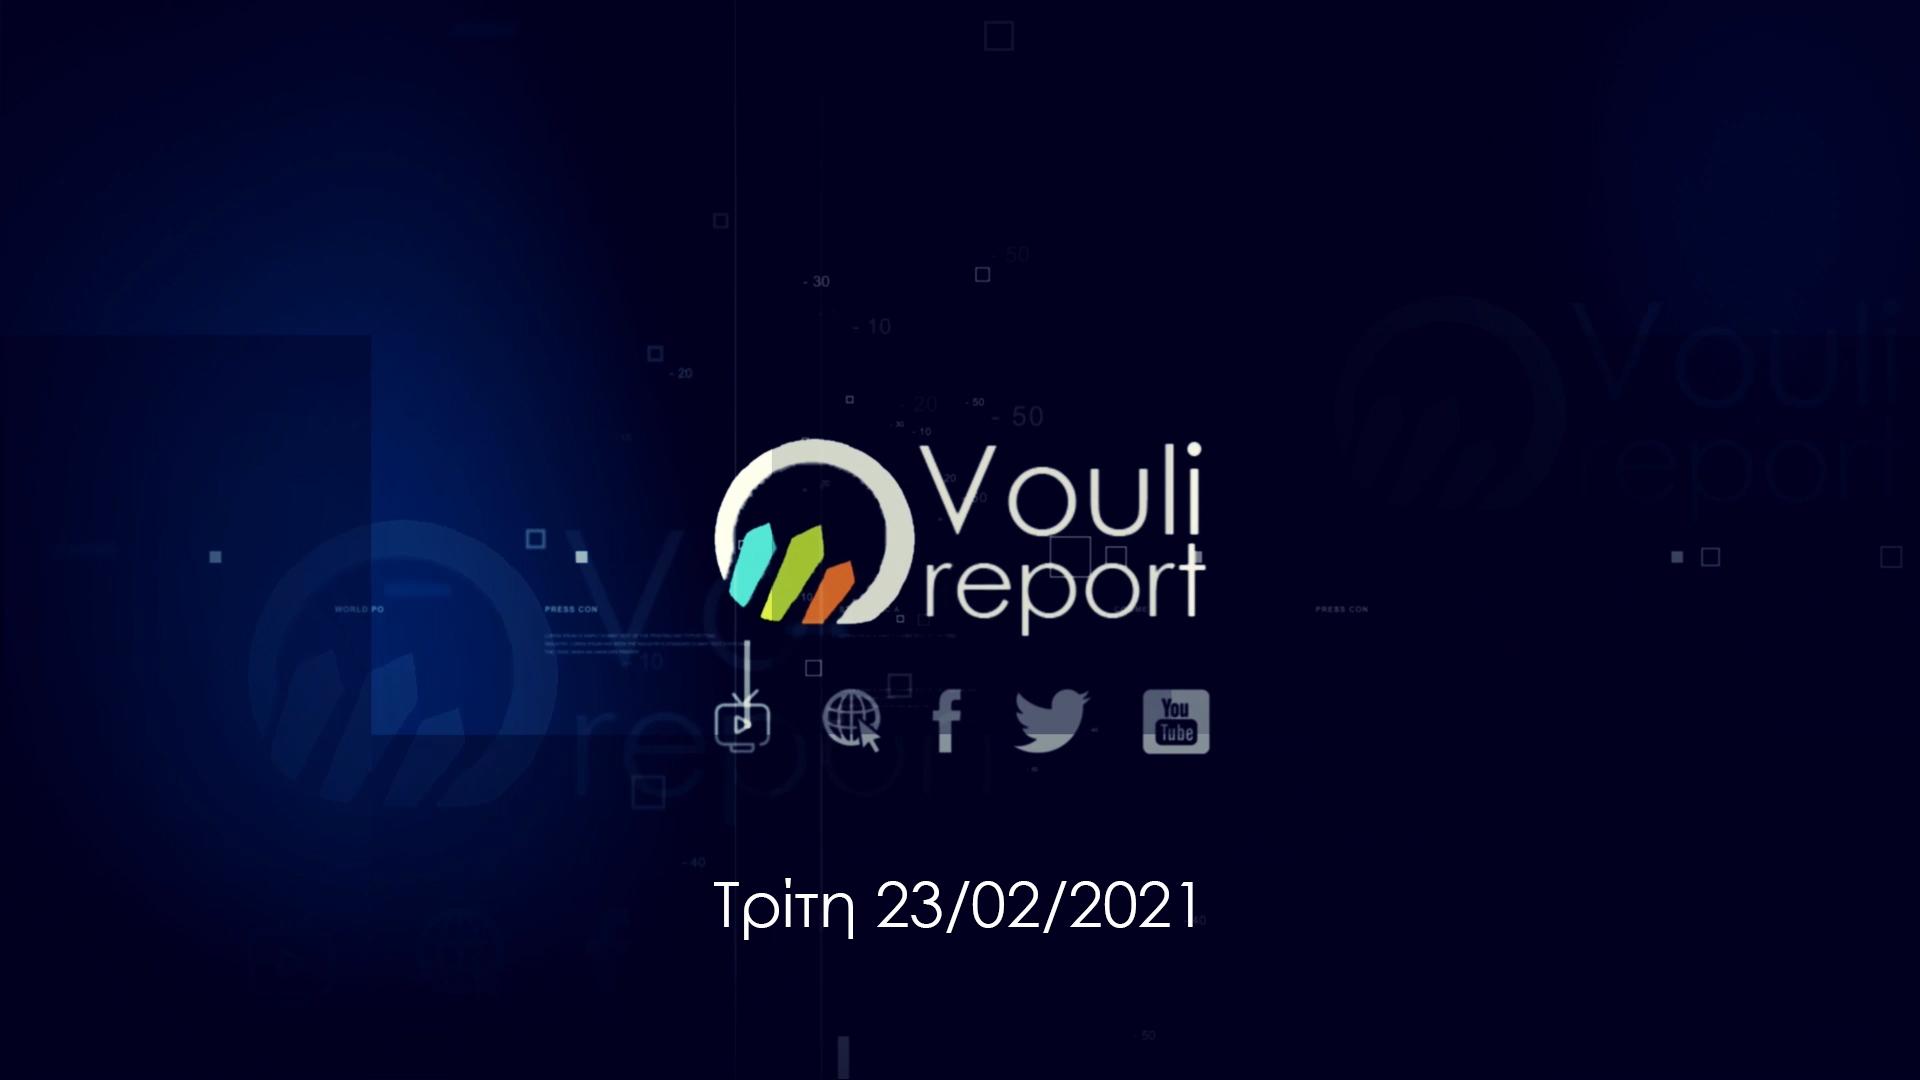 Vouli report | 23/02/2021